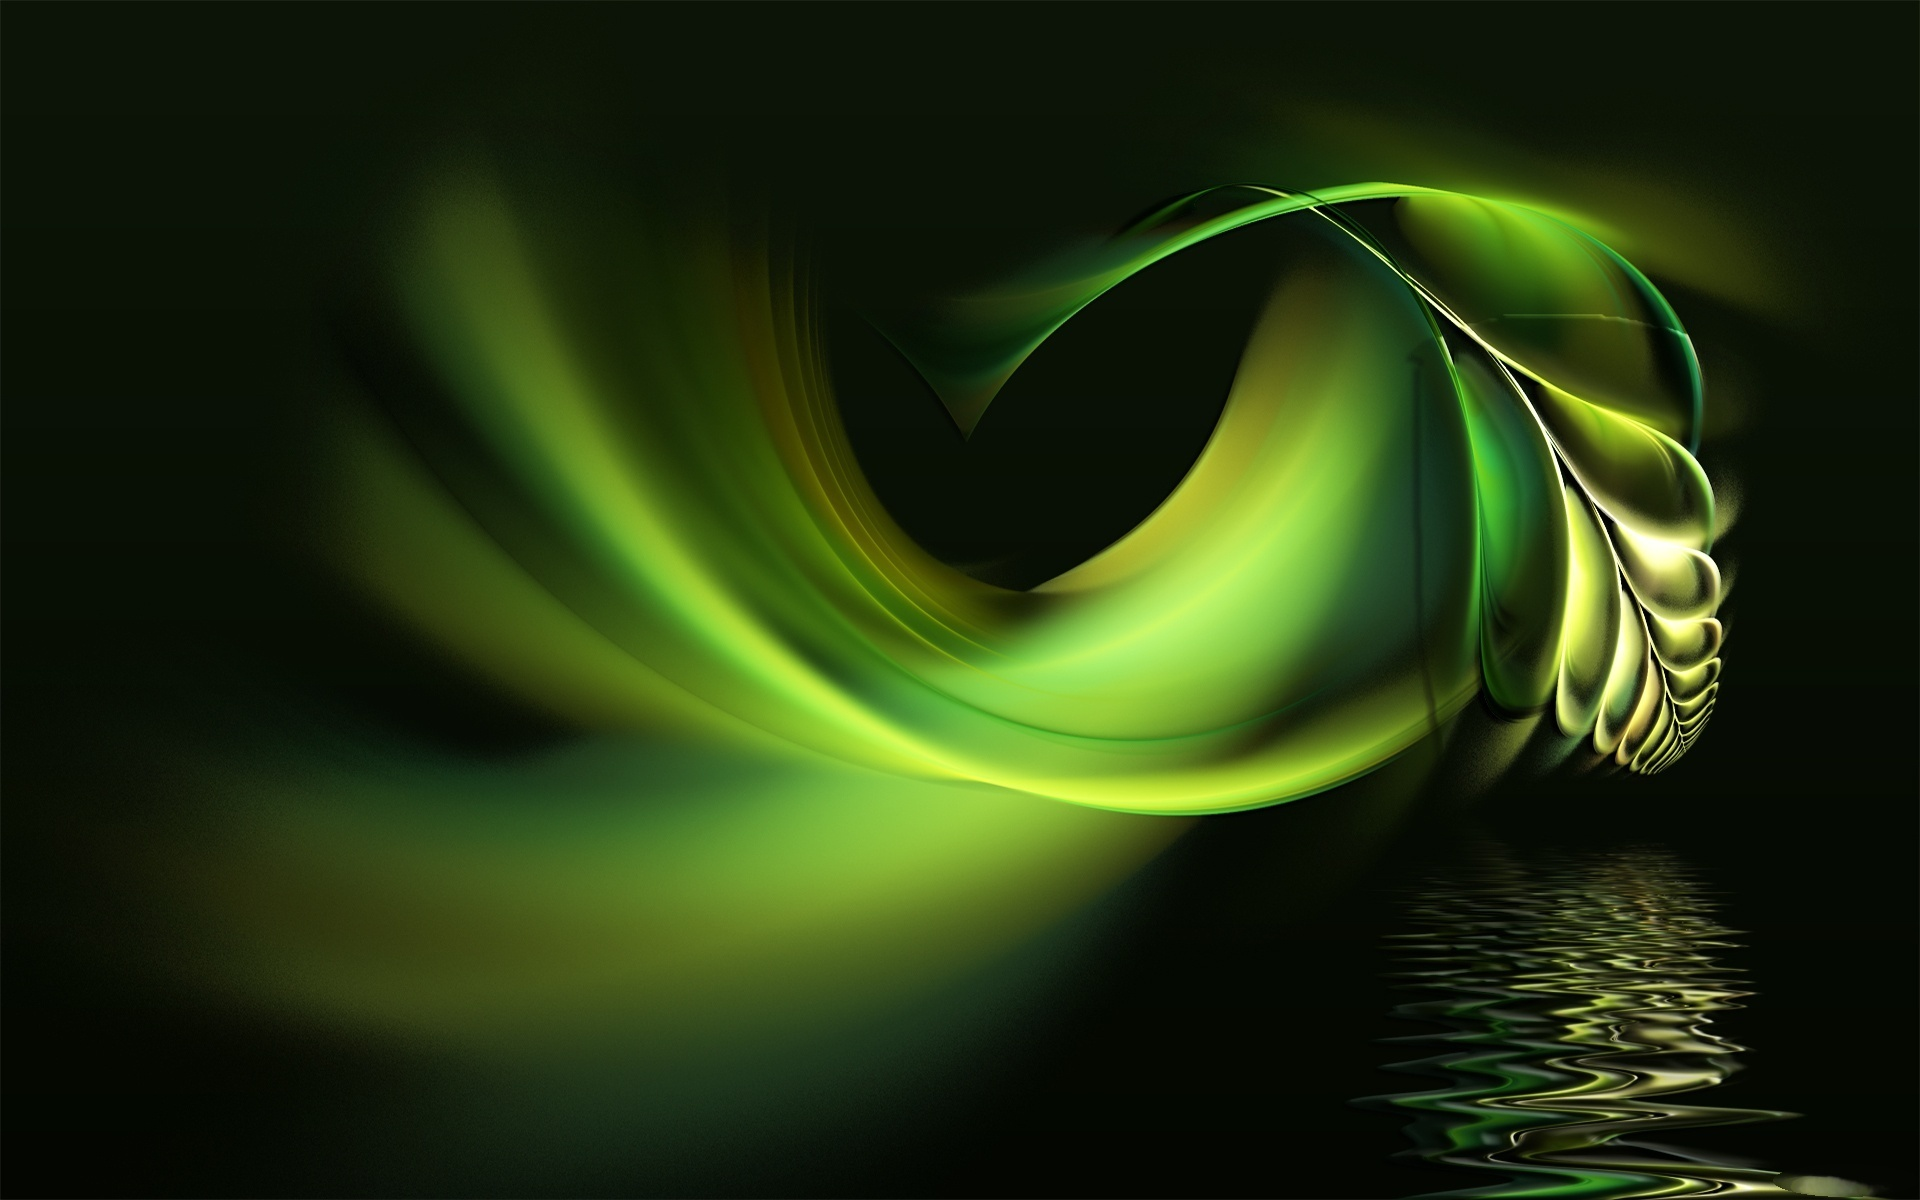 HDoboi.Kiev.ua - Зелёная абстракция на черном фоне, abstract wallpaper green